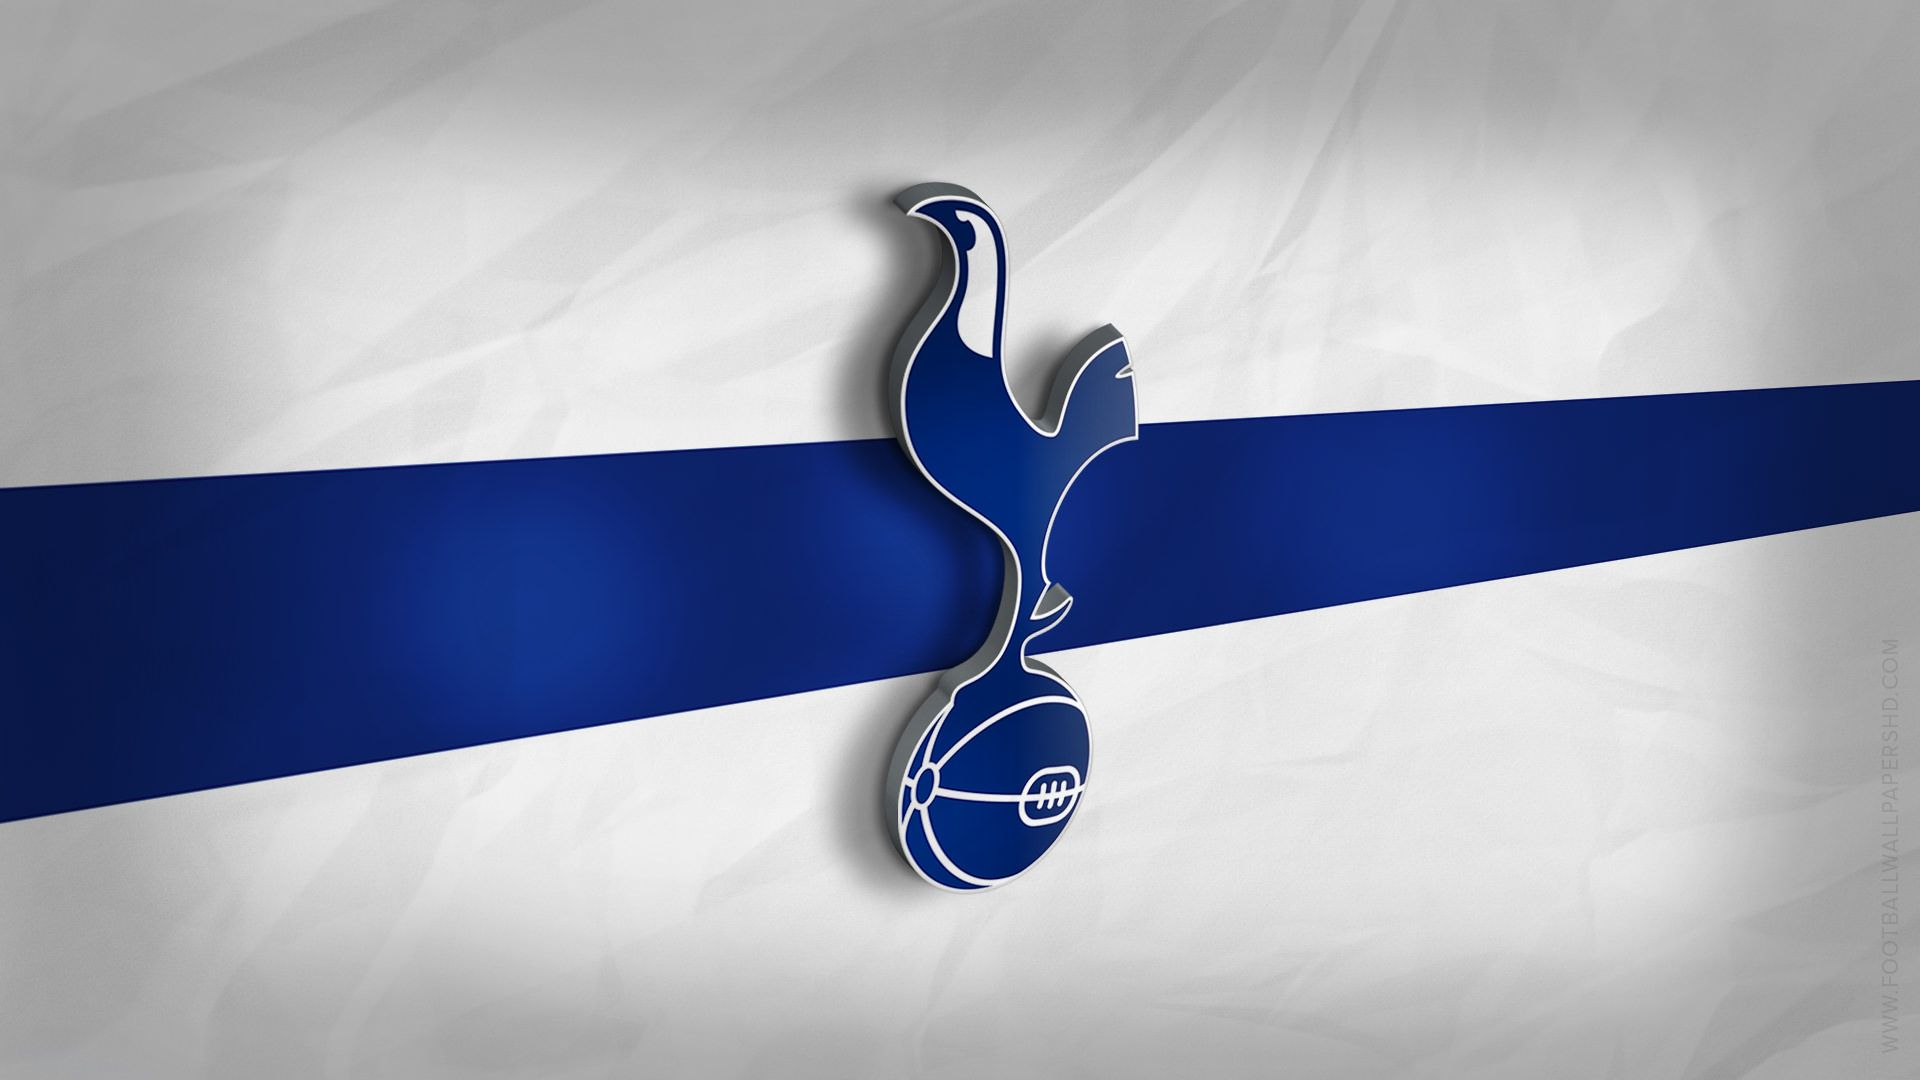 Tottenham Hotspur 3d Logo Wallpaper Football Wallpapers Hd Tottenham Tottenham Hotspur Wallpaper Tottenham Hotspur